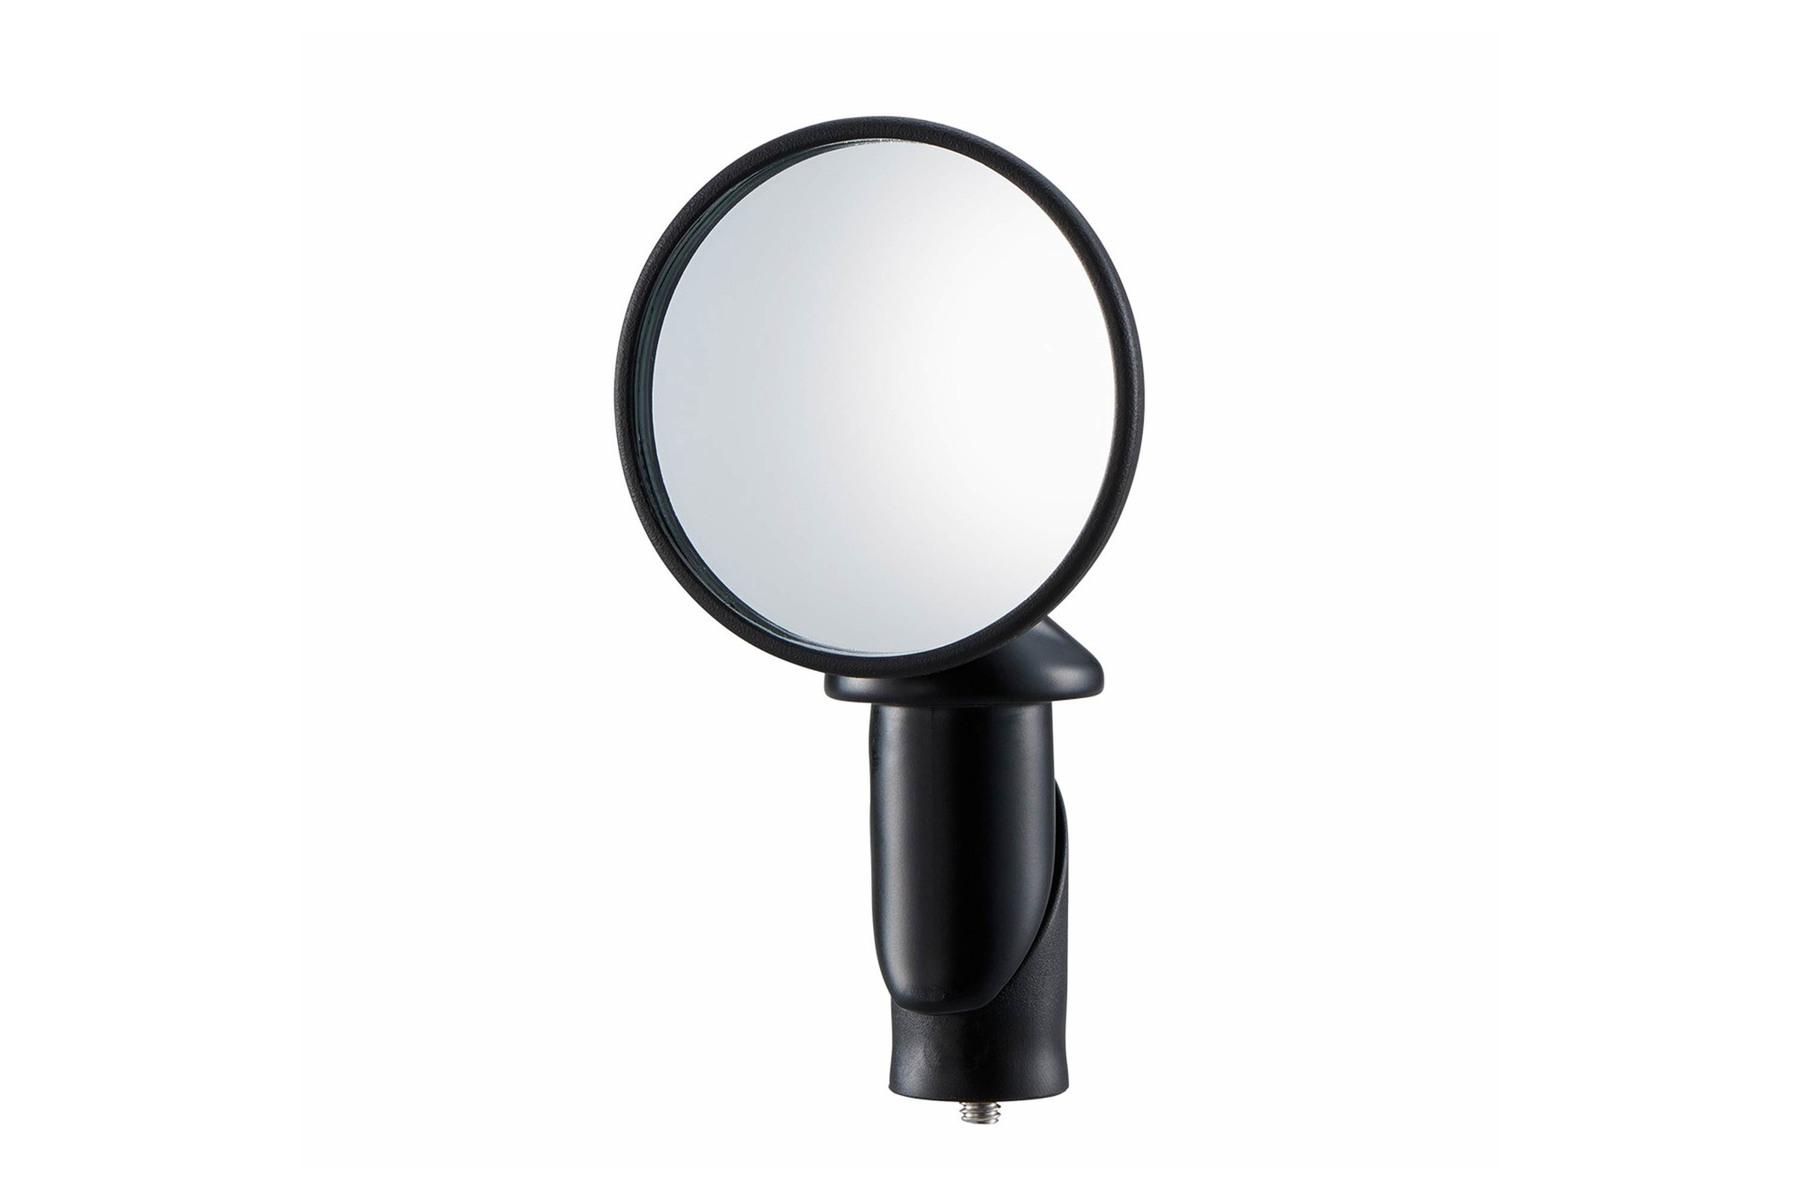 Spiegel Voor Fiets : Cateye spiegel fiets cat bm g in stuur zwart spiegel fiets cat